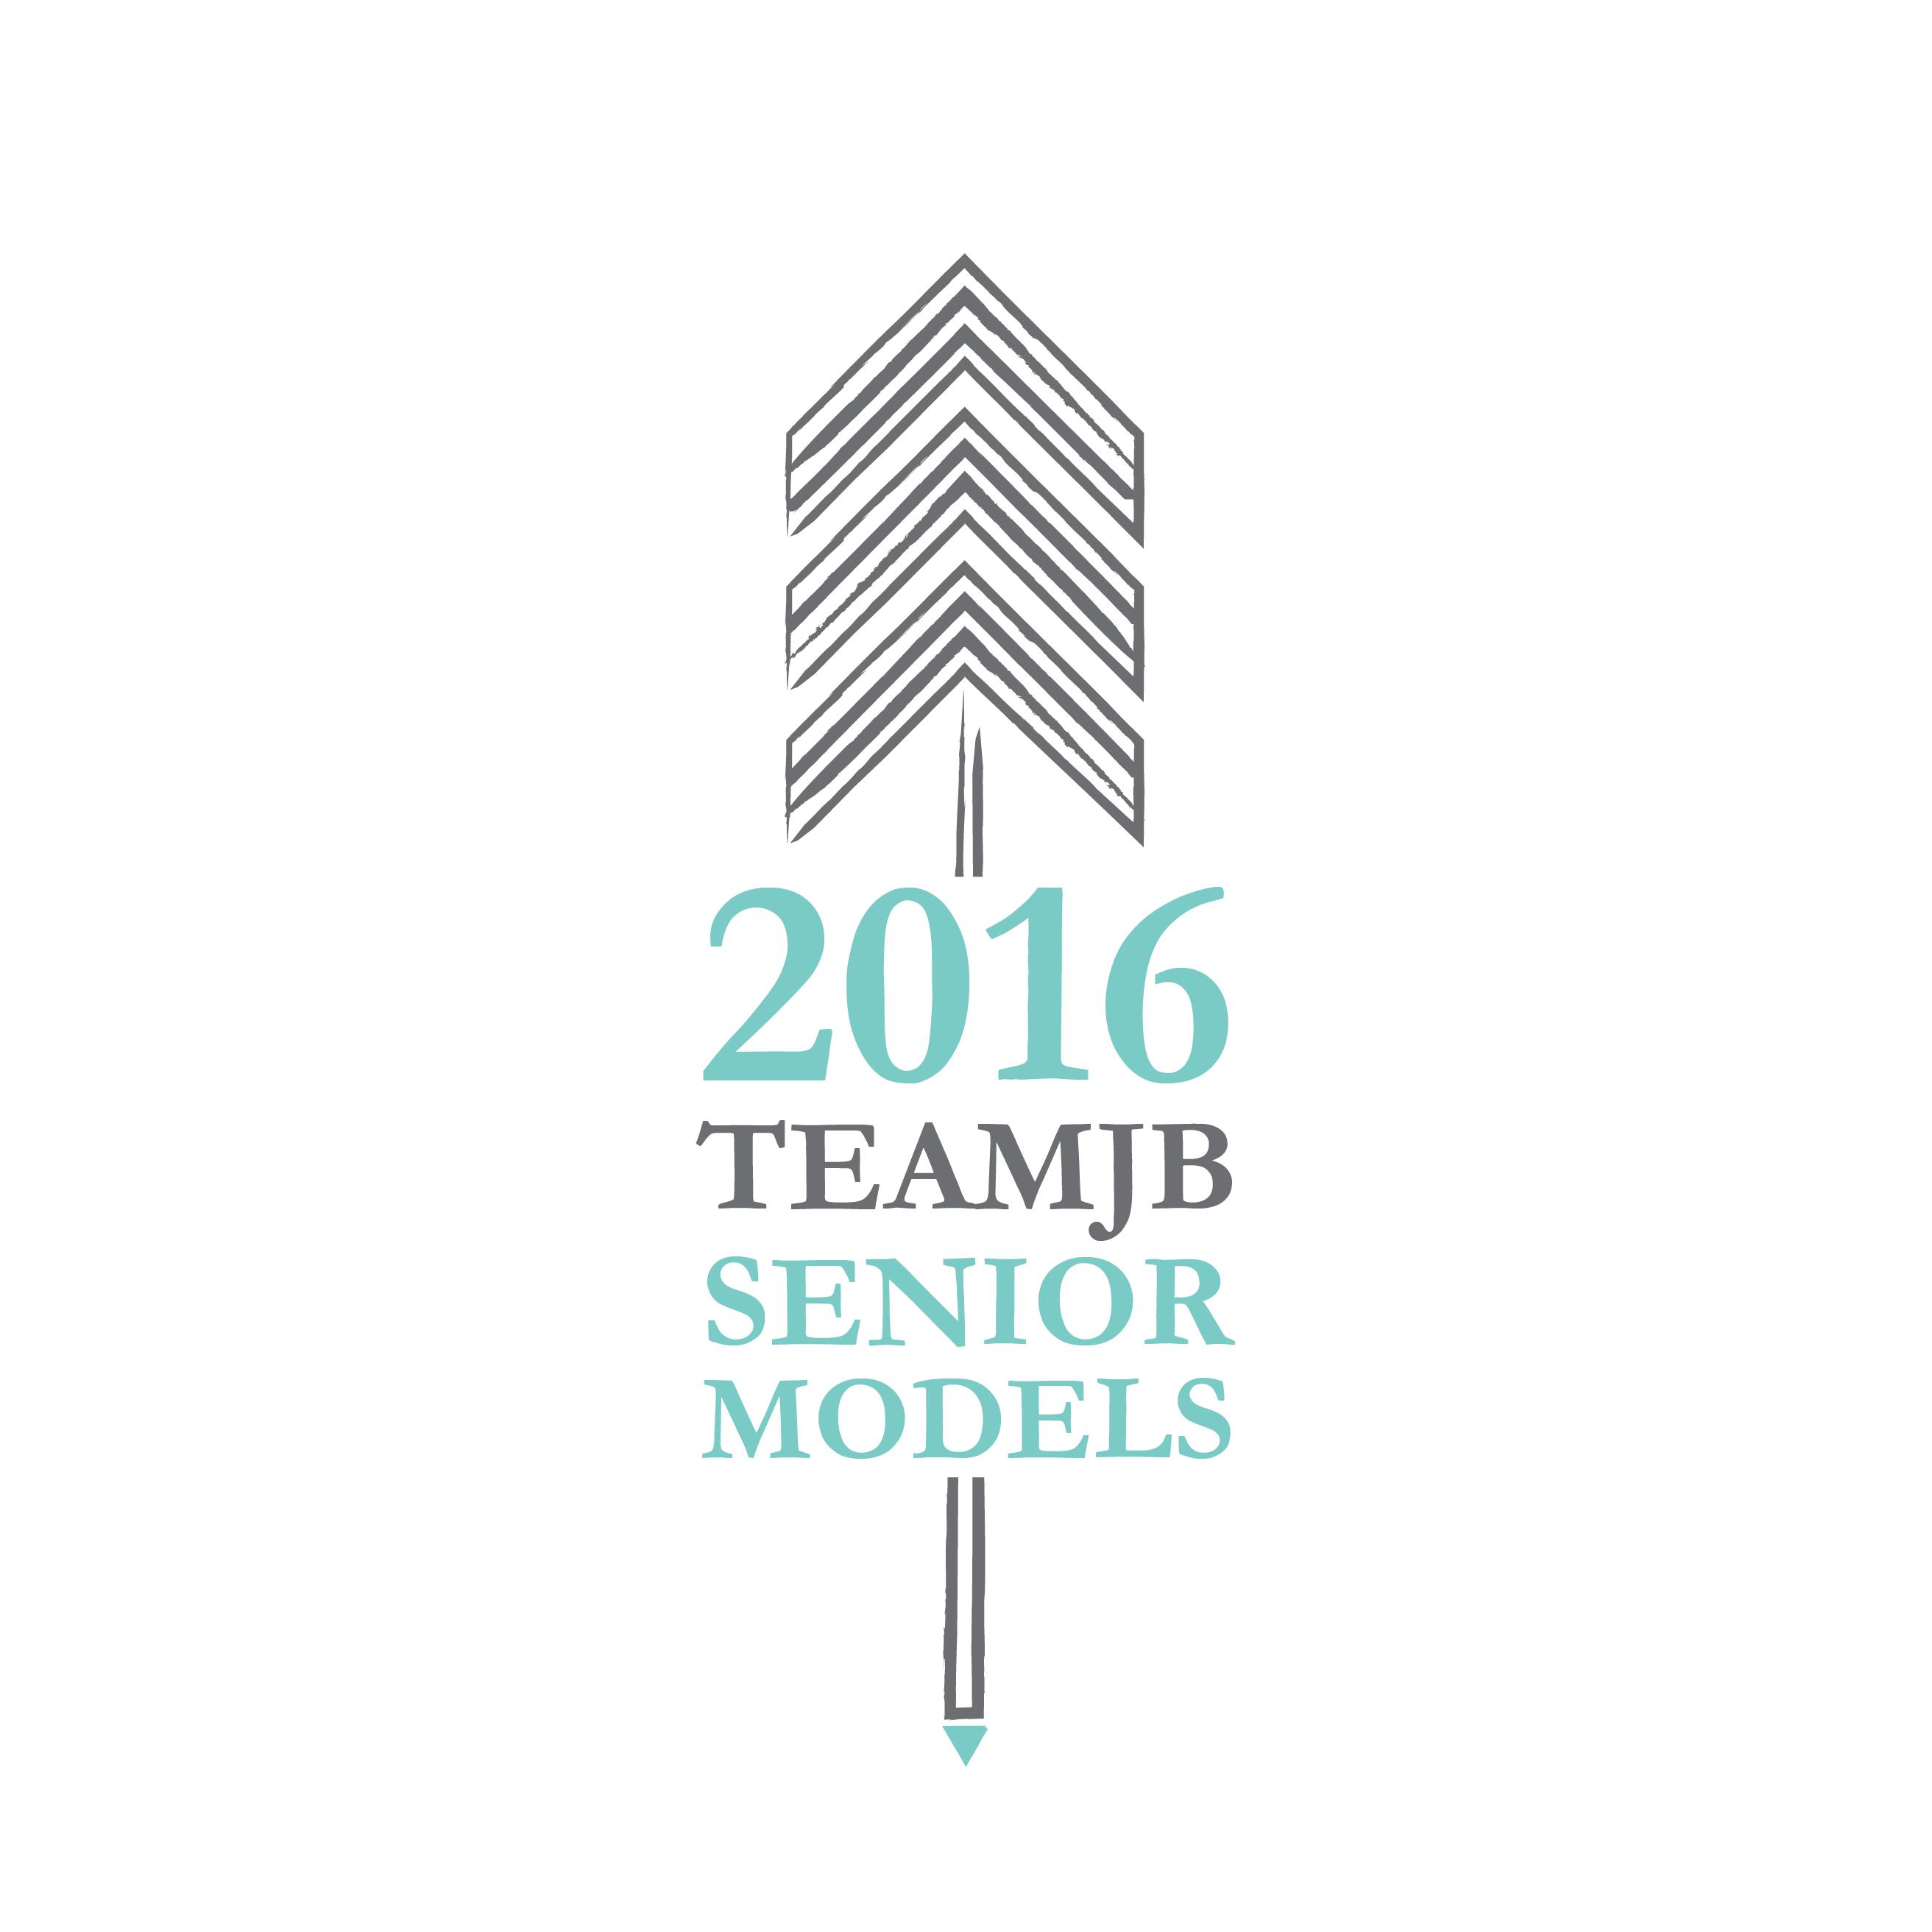 2016 Team Jb Senior Model Program Senior Portraits